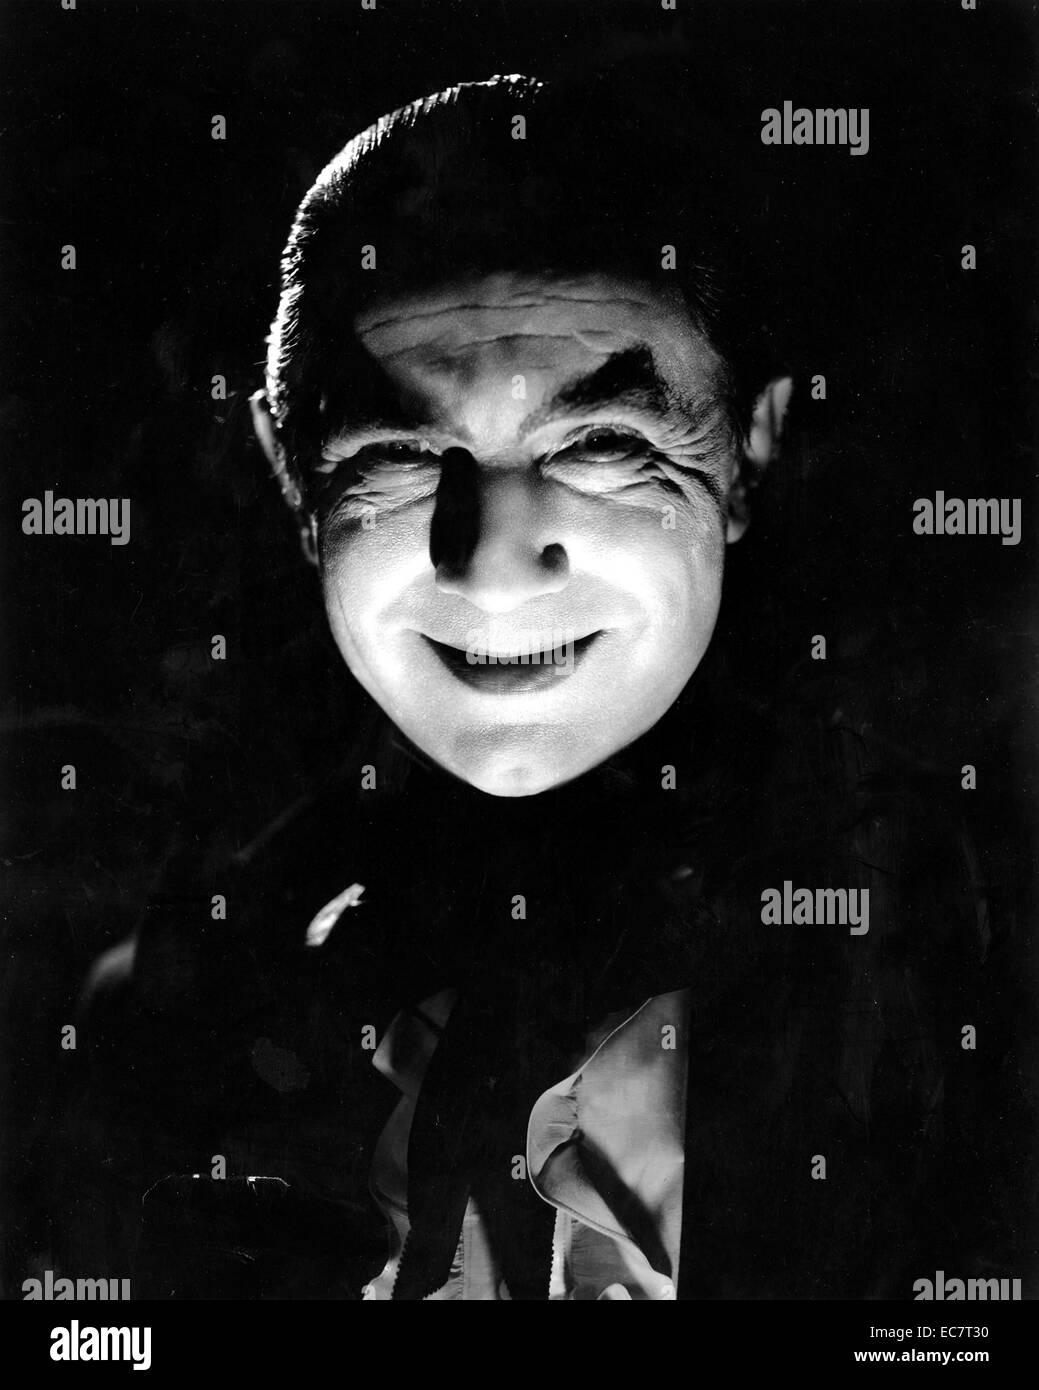 Mark of the Vampire - Stock Image